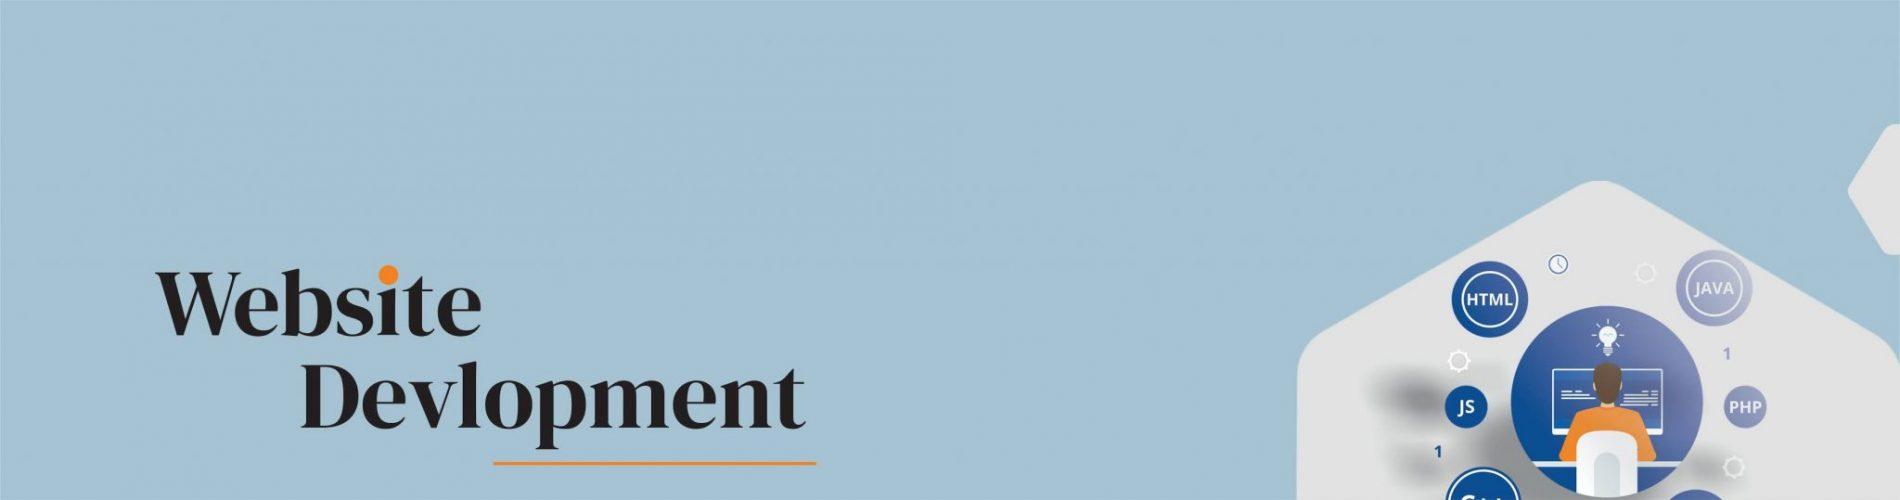 website development company in chandigarh